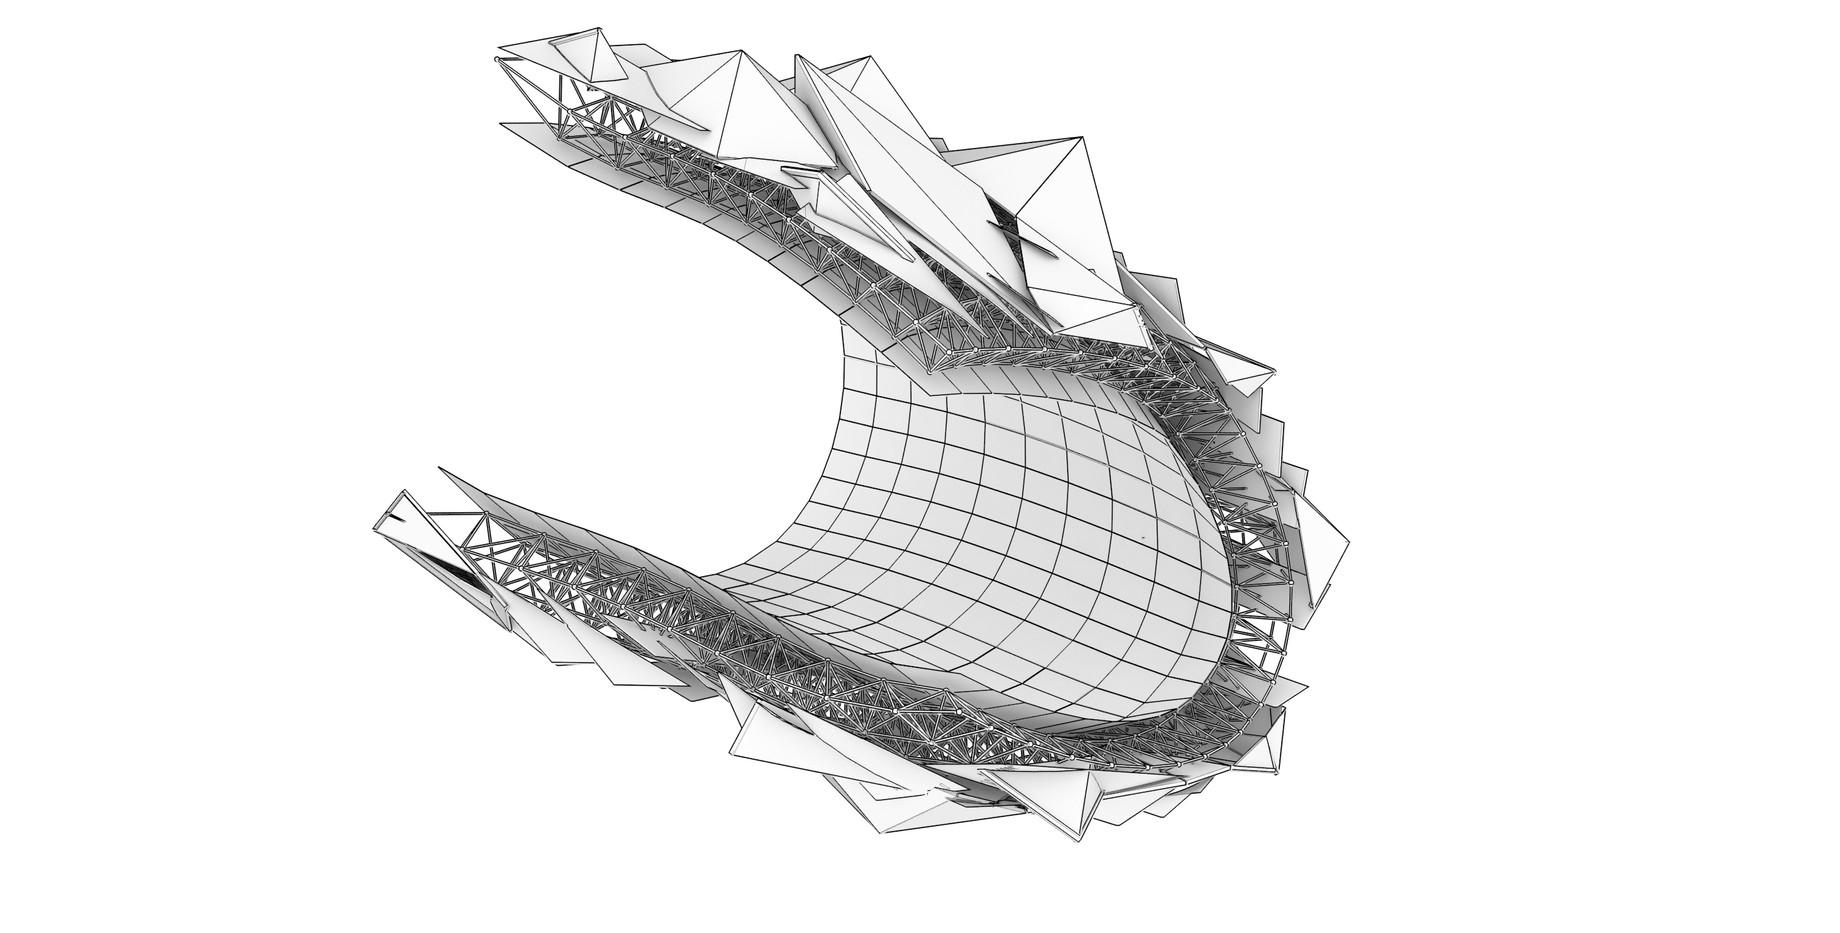 Panel Density Study IV